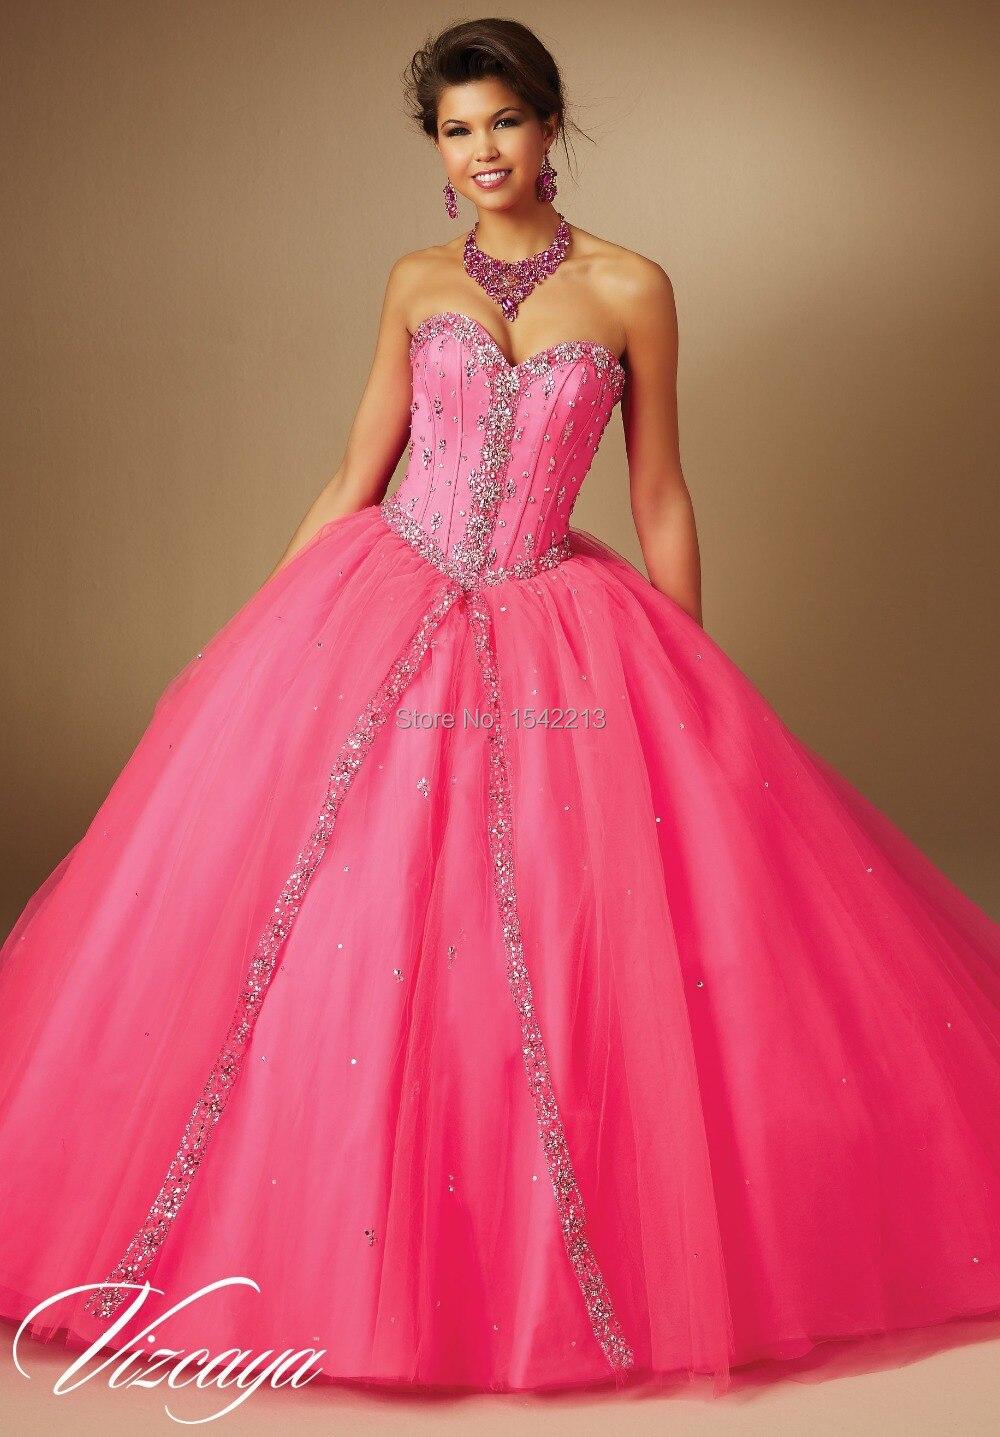 d86ea2d9670 Hot Pink Elegant Quinceanera Dress Long Sweetheart Beaded Vestido De Girl  Sweet 16 Dresses 2017 Summer